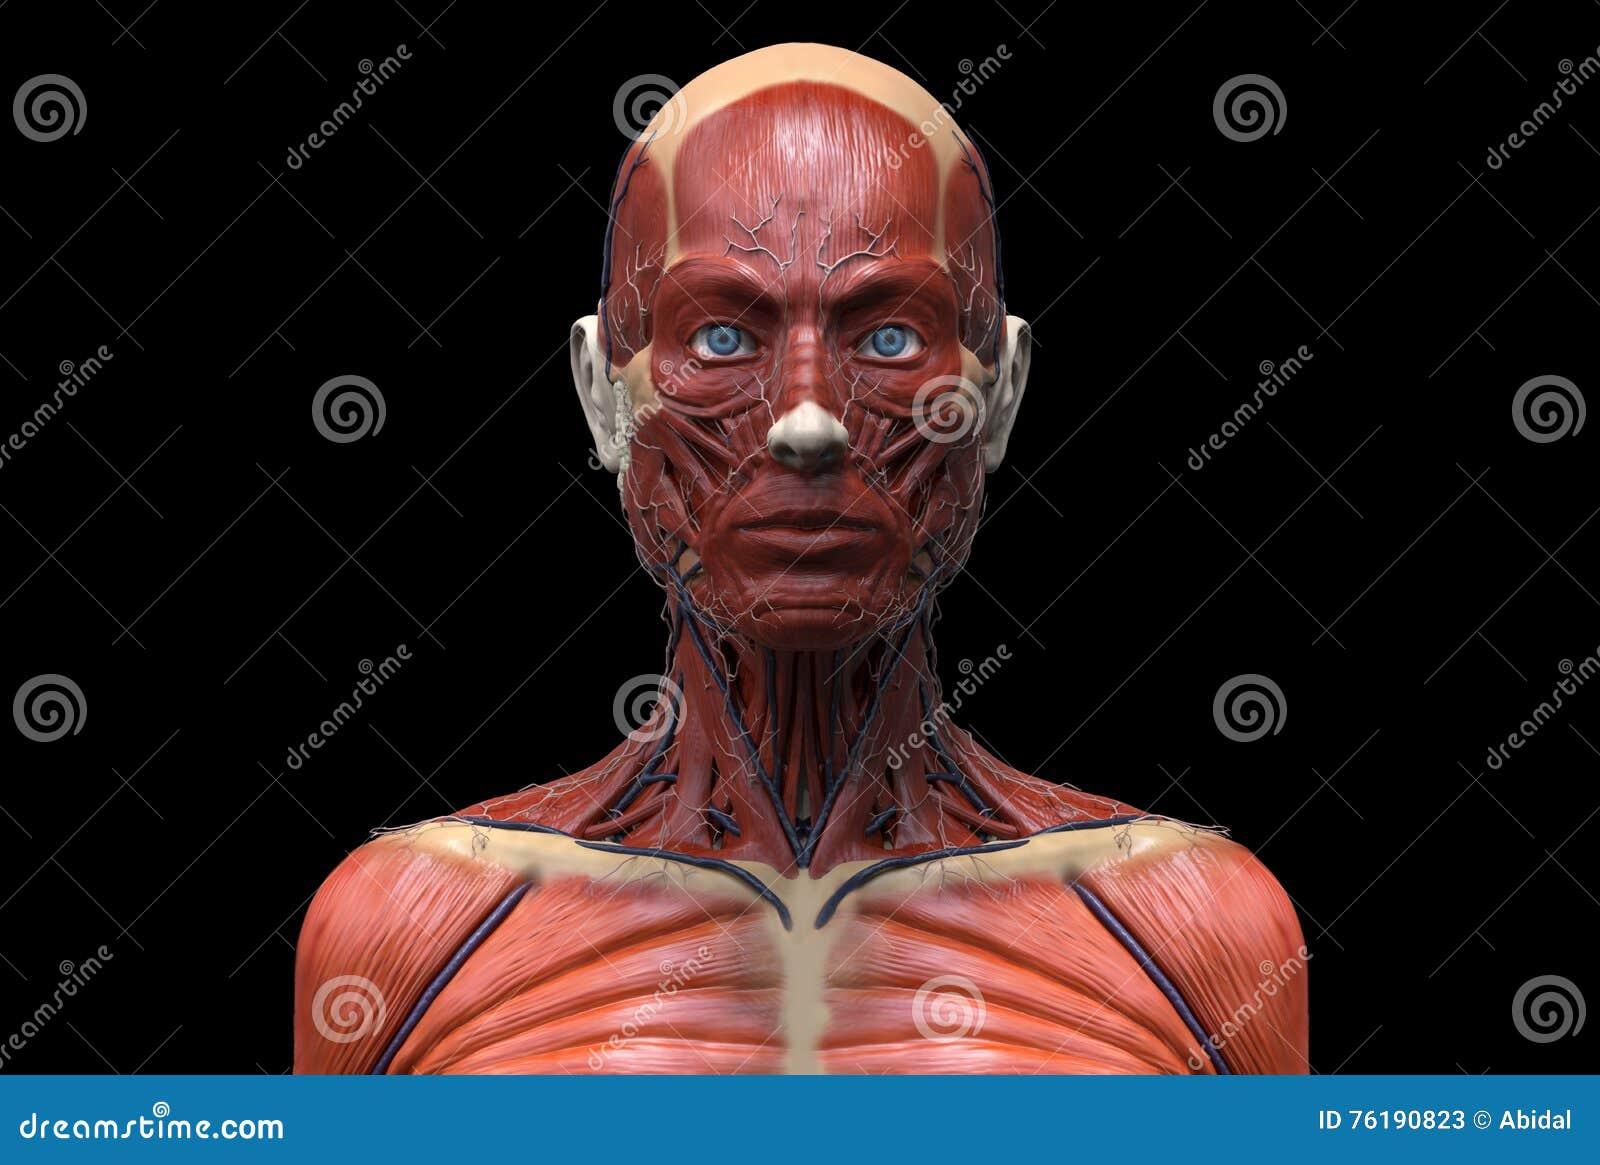 Human Body Anatomy Of A Female Stock Illustration Illustration Of